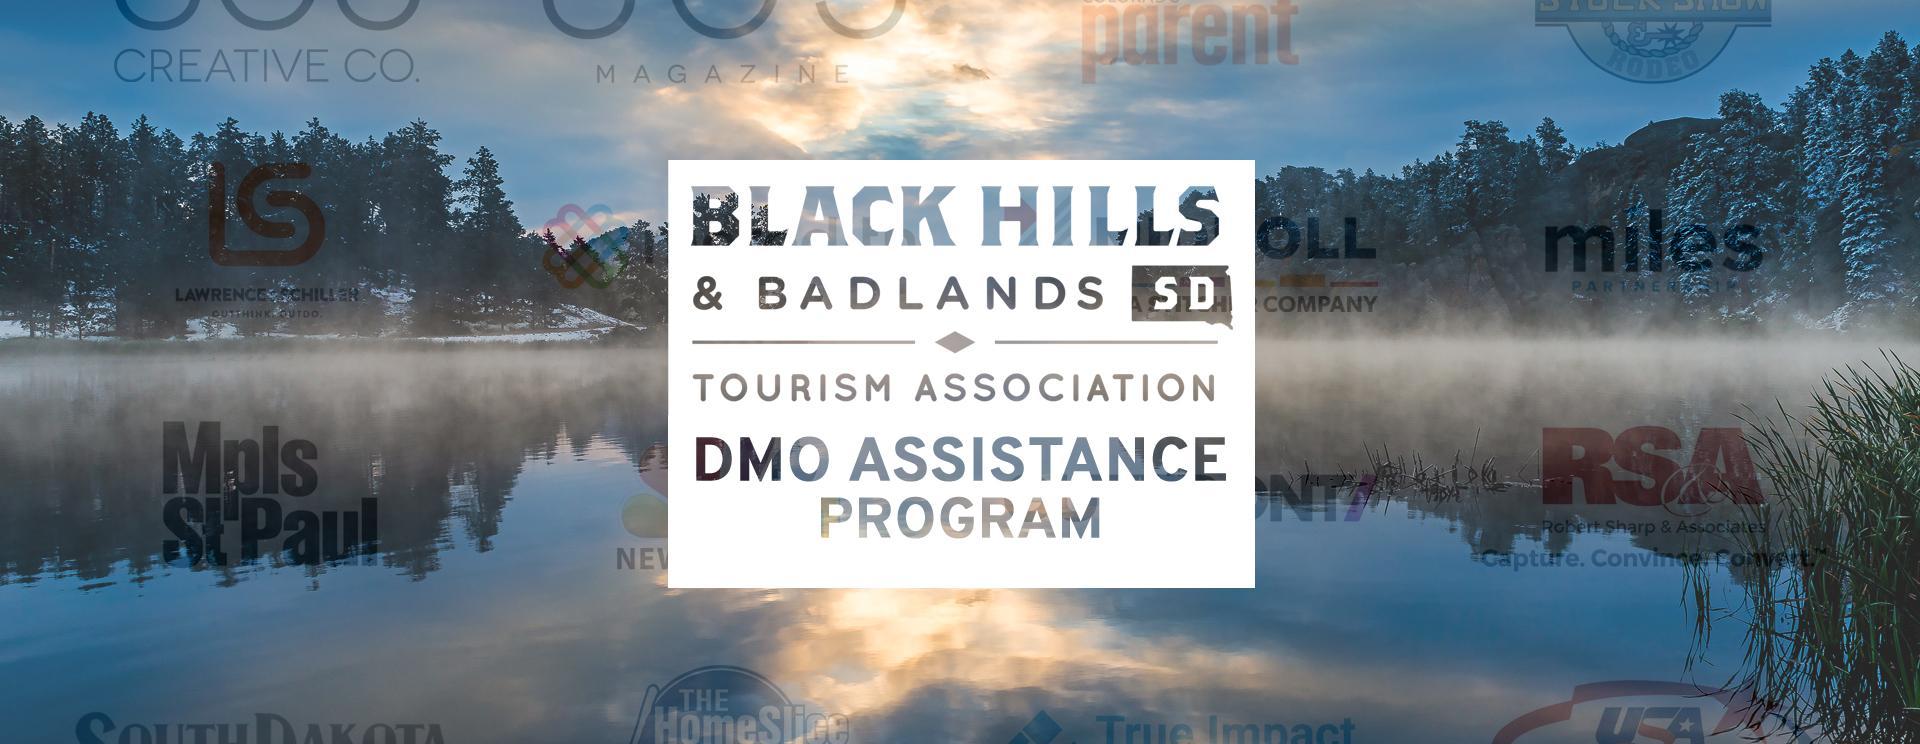 DMO Assistance Program — Regional Support Through Diverse Tactics and Partnerships